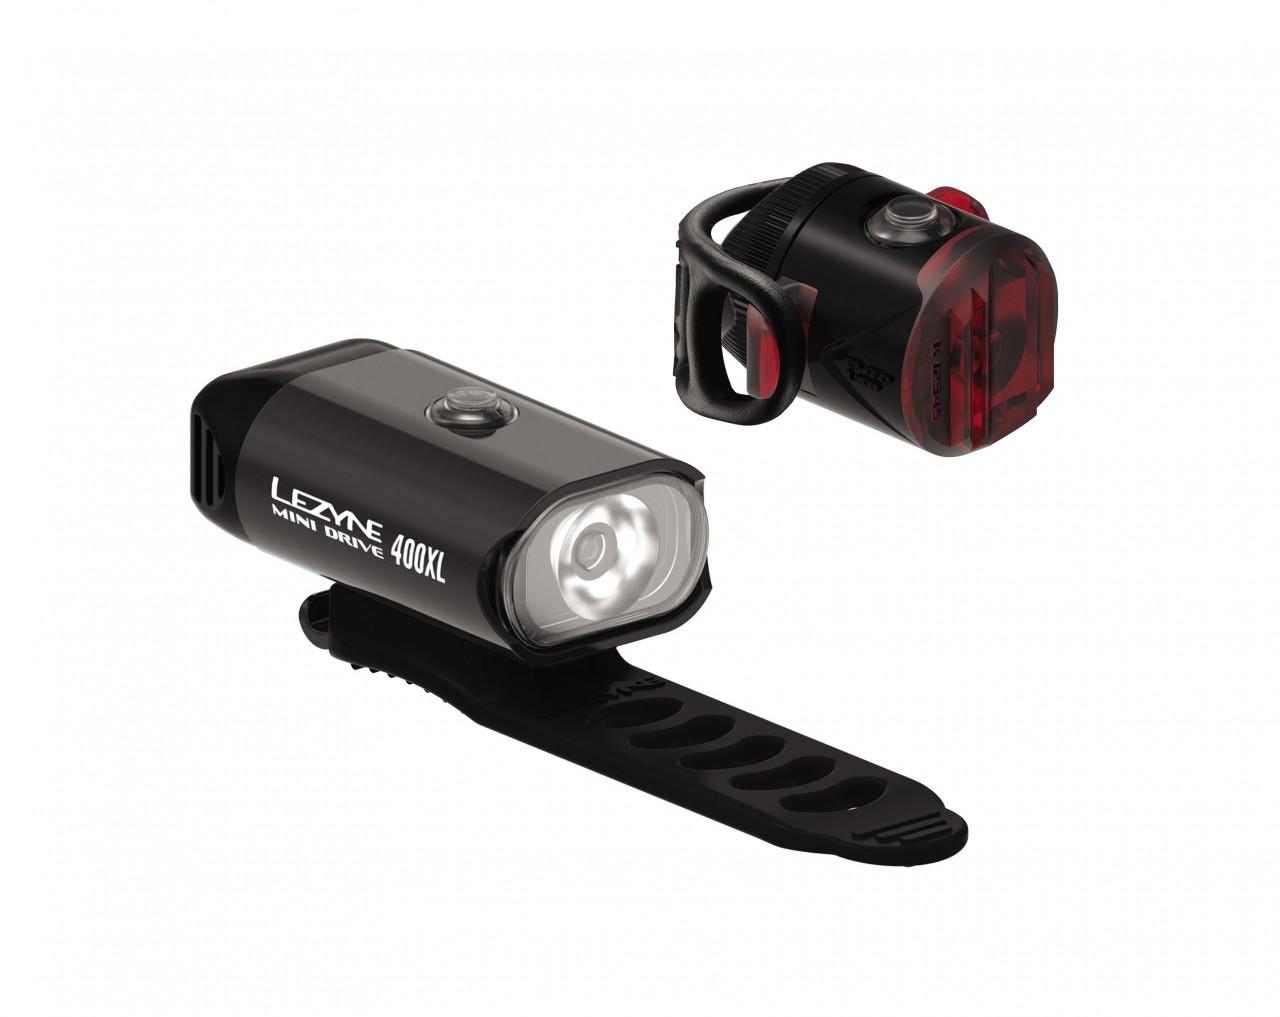 LEZYNE Set svetiel MINI Drive 400XL a Femto USB čierne, 400 Lumenov